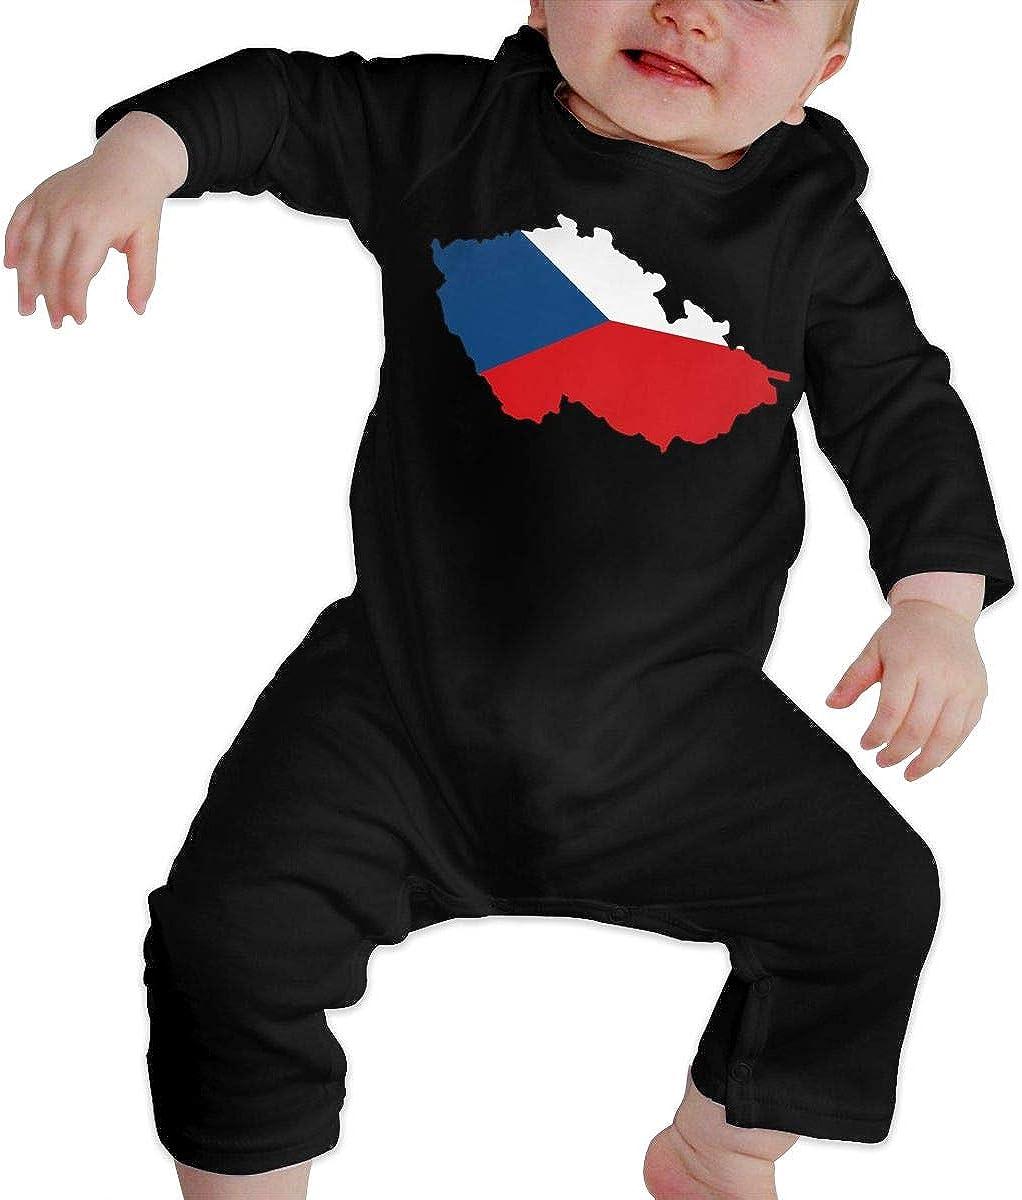 YELTY6F Czech Republic Flag Map Printed Boys Girls Jumpsuit Long Sleeve Romper Black